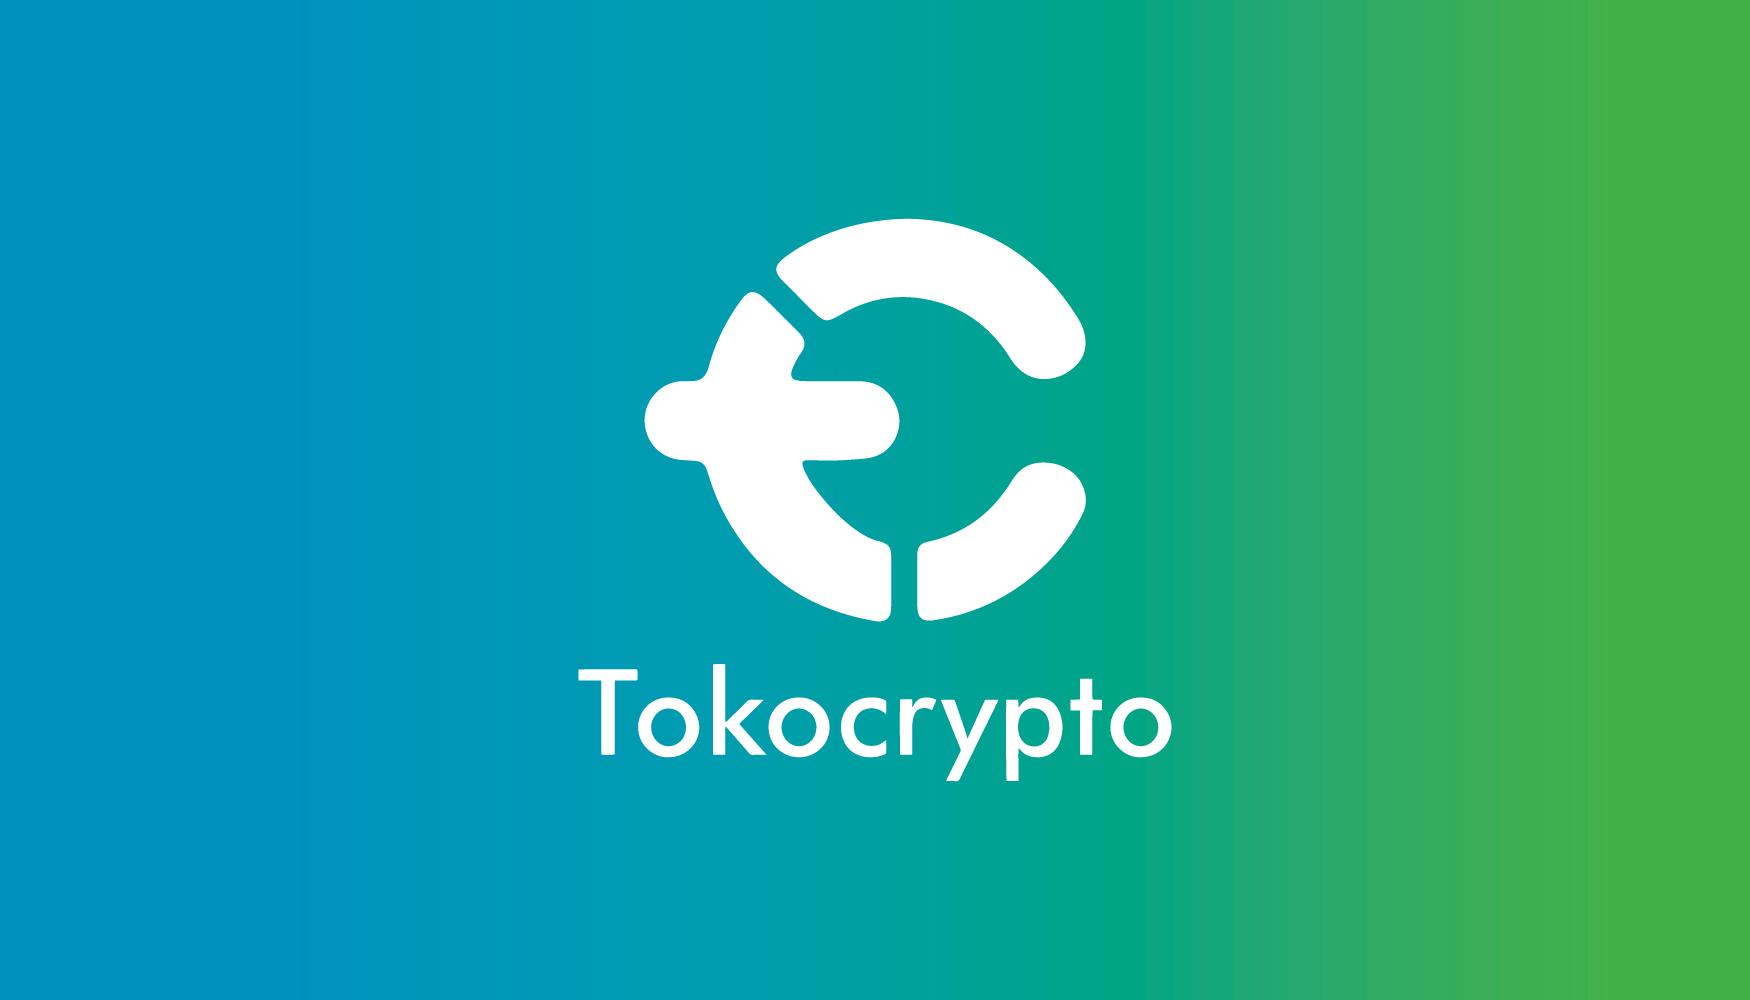 Tokocrypto Hadirkan Kemudahan untuk Investasi Kripto Anda